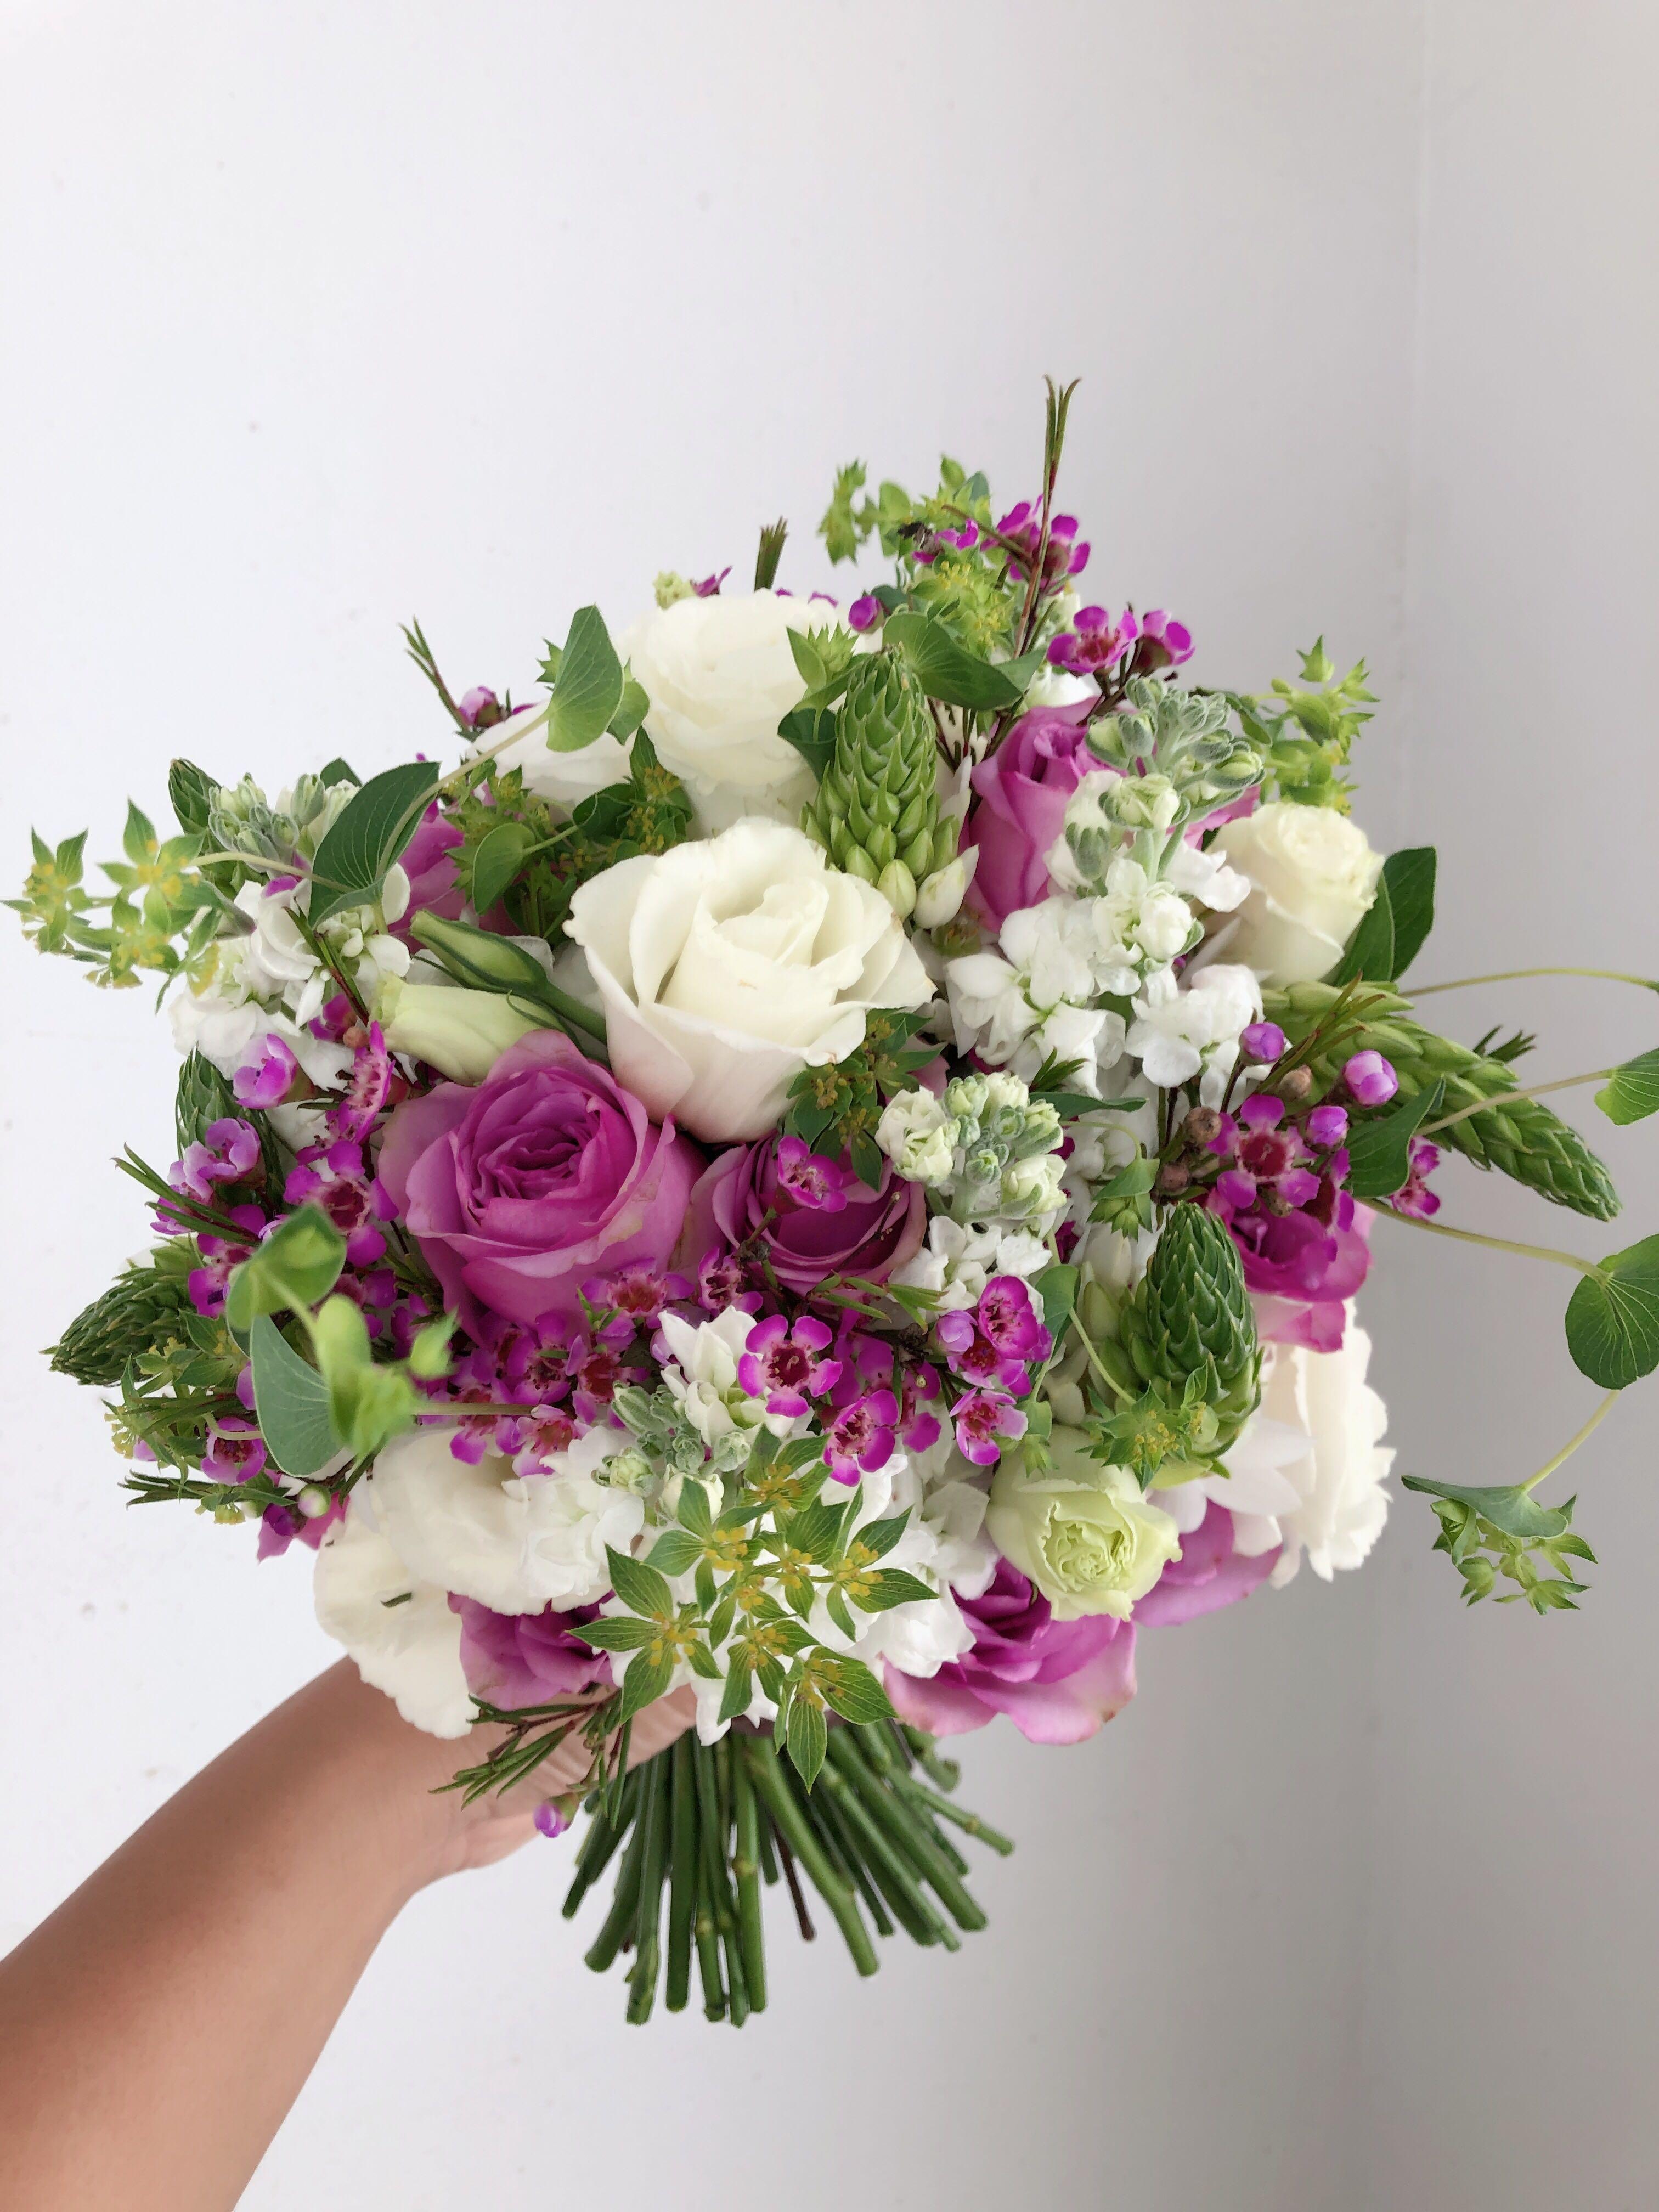 Fresh flower bridal bouquet gardening flowers bouquets on carousell izmirmasajfo